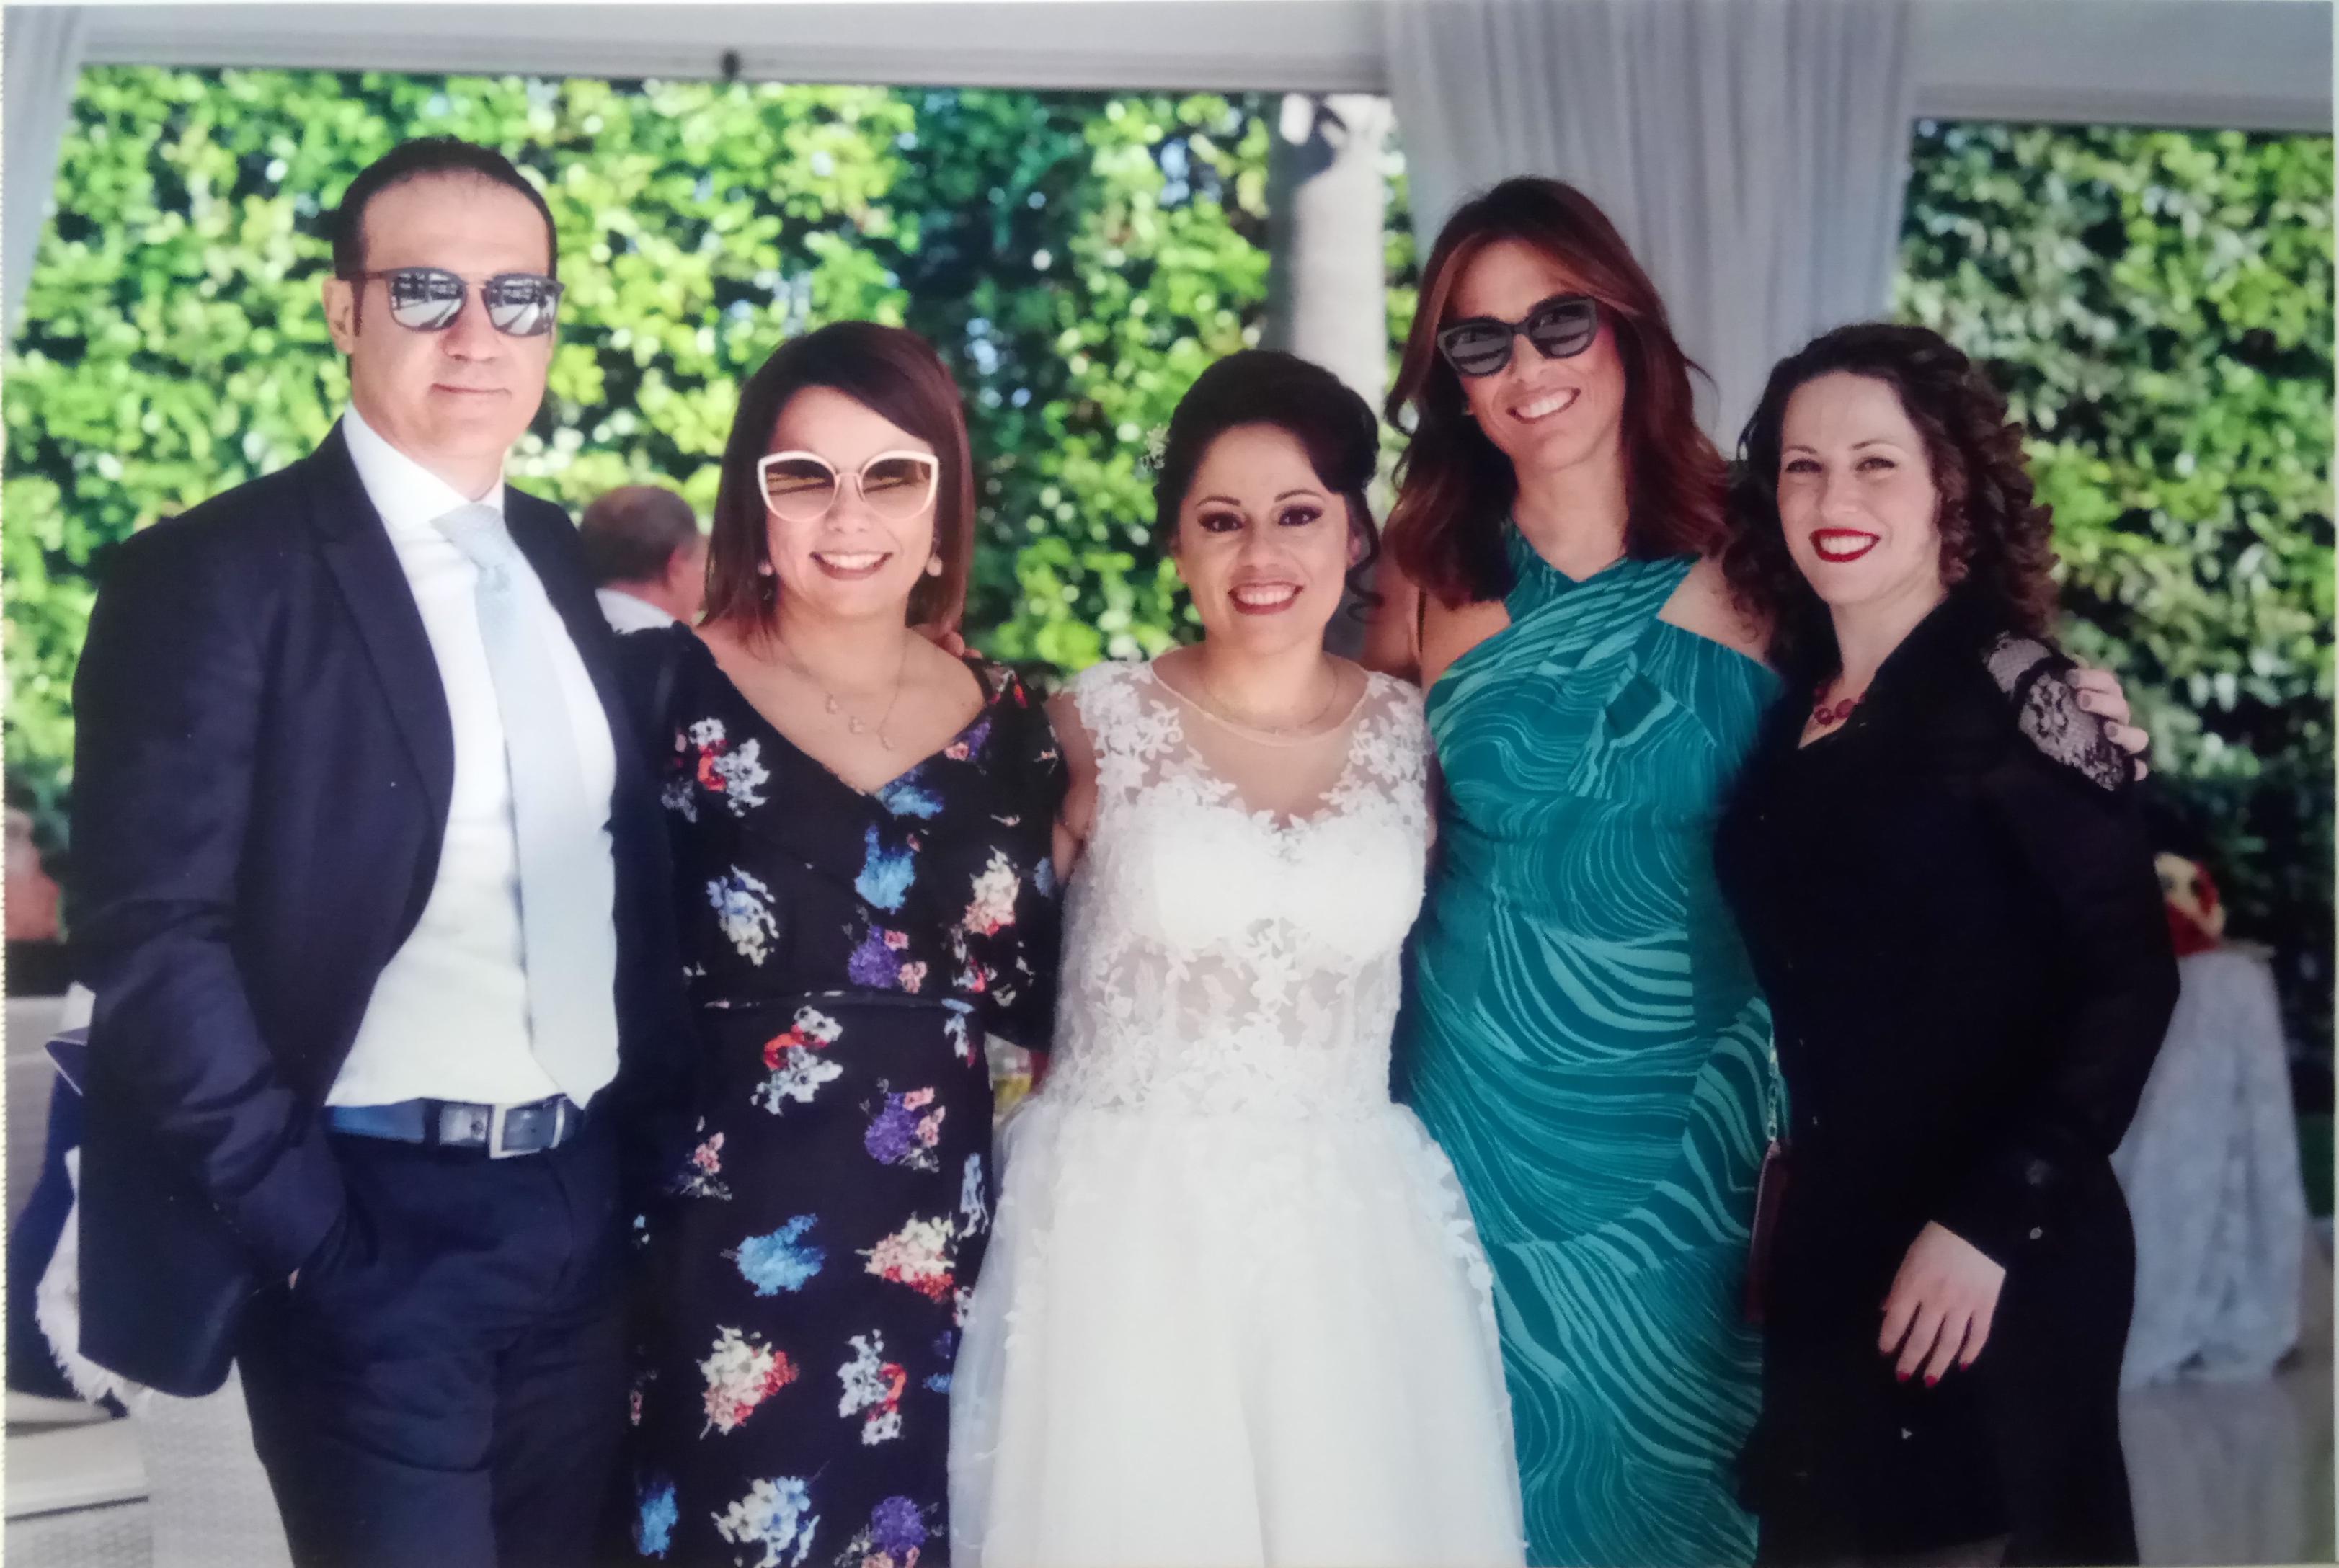 Emiliana's wedding